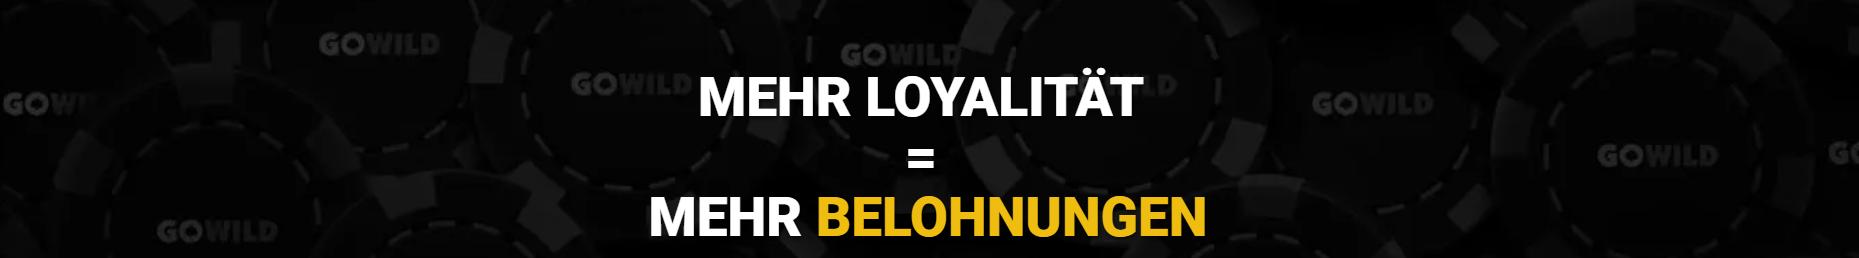 GoWild Casino Loyalität